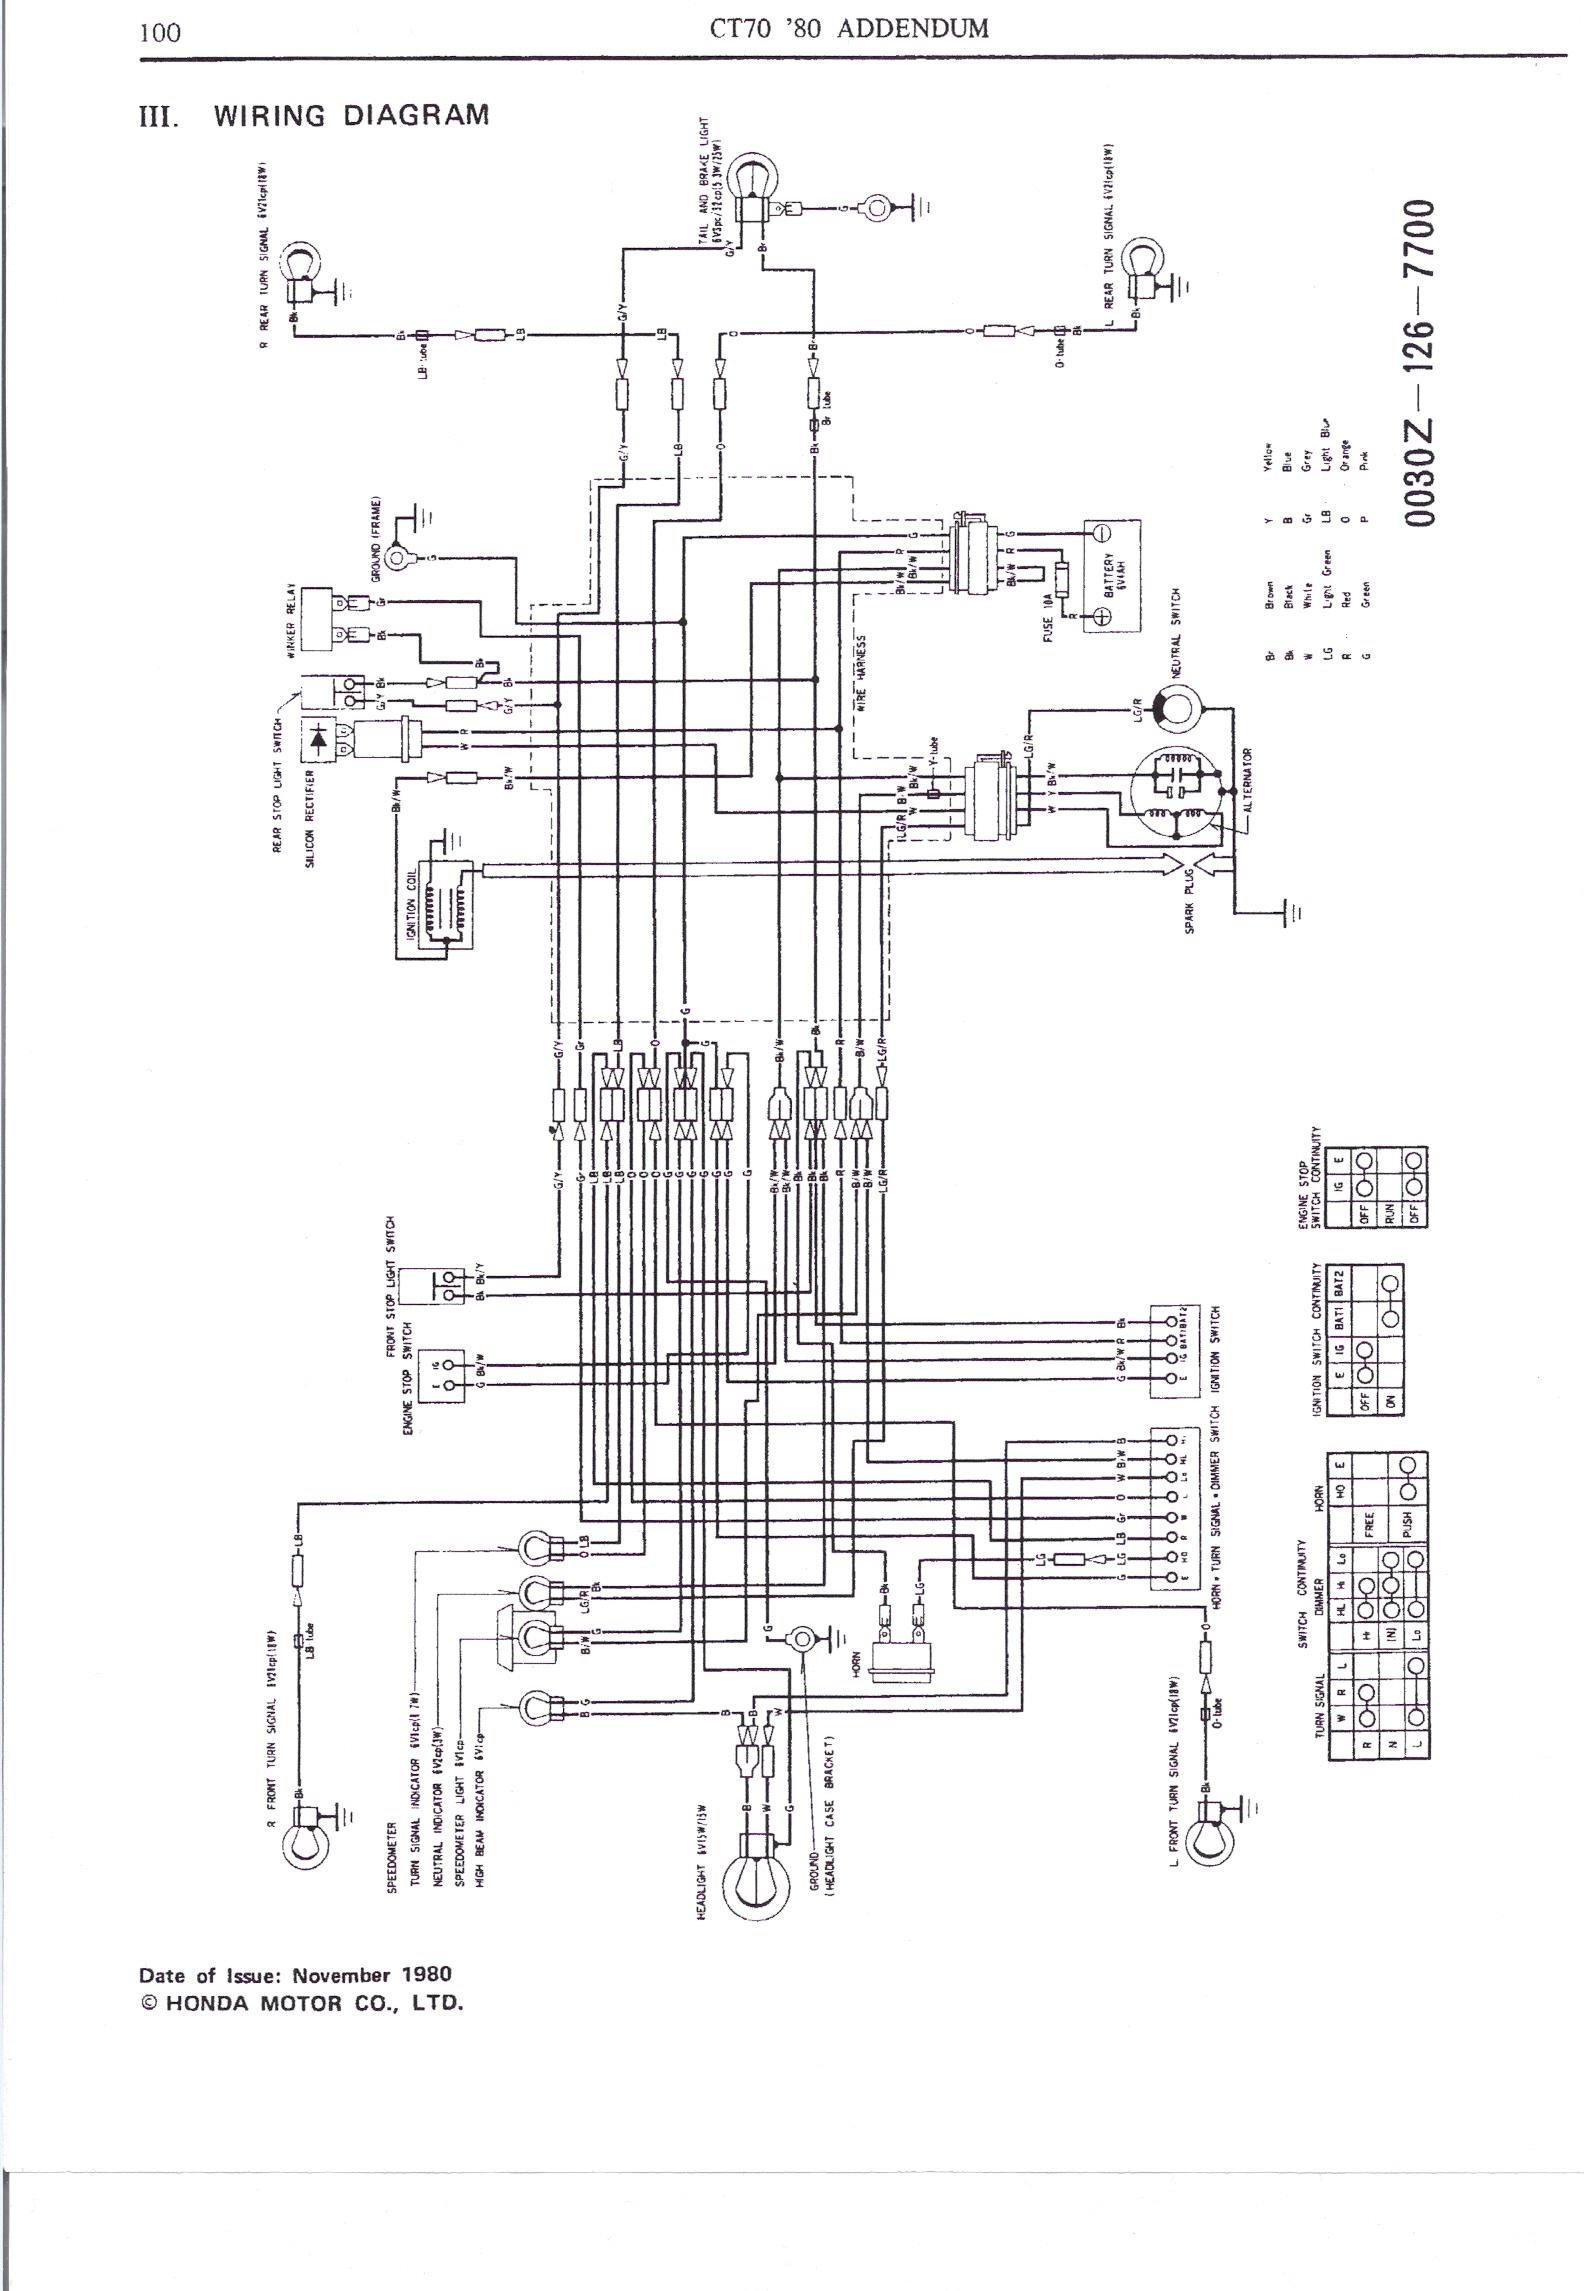 1974 Yamaha Dt Wiring Diagram likewise Honda Parts likewise 1972 Honda Xl 250 Wiring Diagram moreover Alternator Wiring Diagram With Voltage Regulator together with Wiring Diagram 1970 Honda Trail 70. on honda ct90 wiring diagram